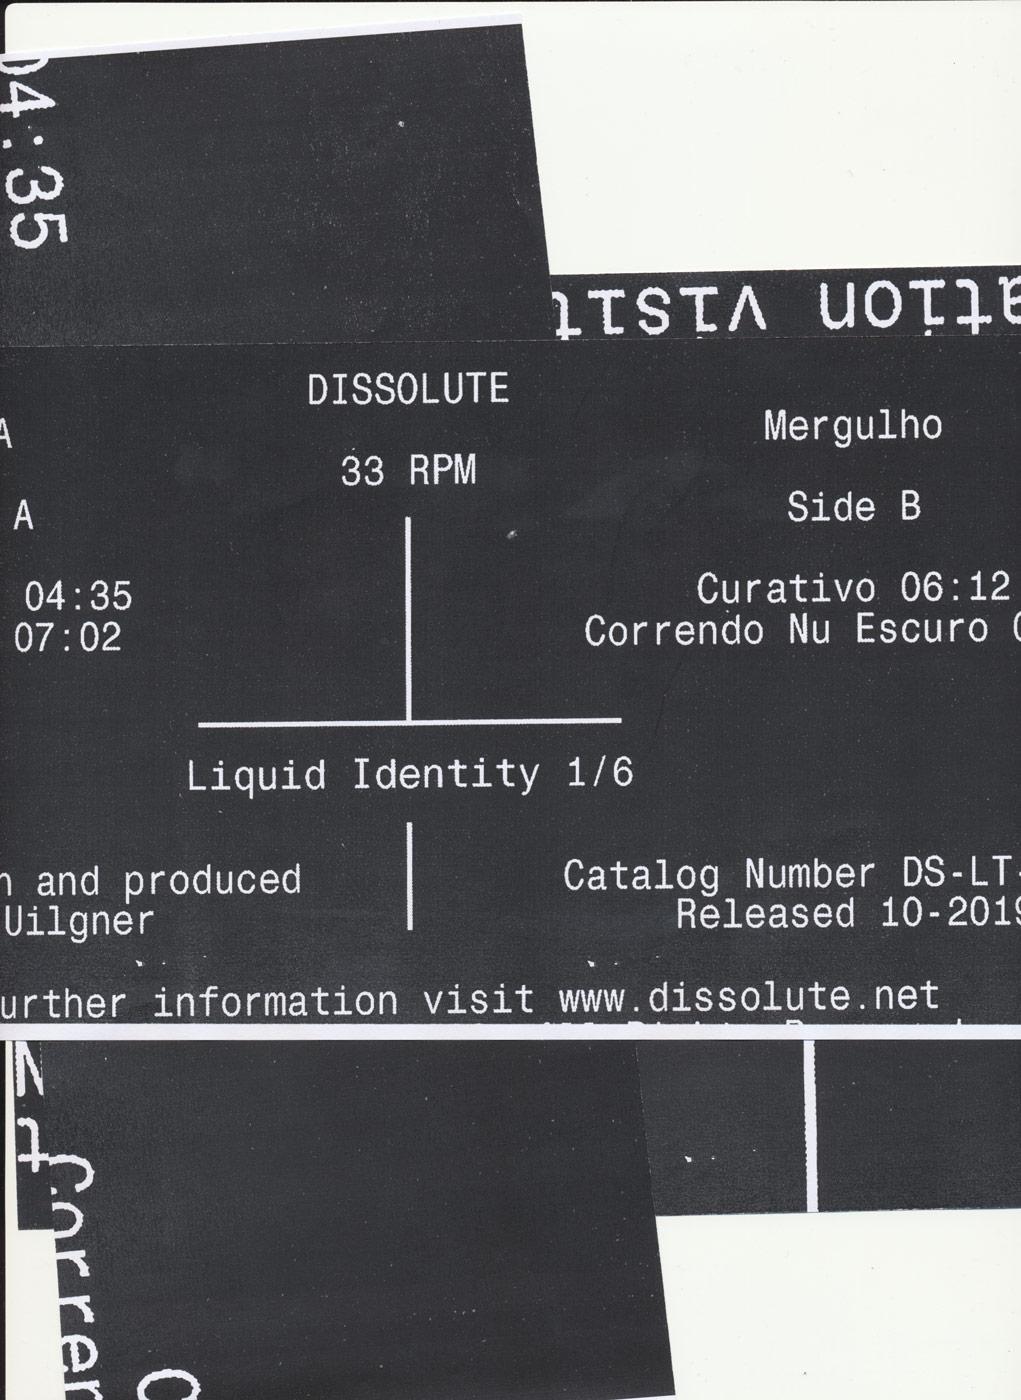 07 collide24 COLIN DOERFFLER MAX LANGENBACHER - Colin Doerffler and Max Langenbacher on the fluid design for Dissolute's Liquid Identity Series